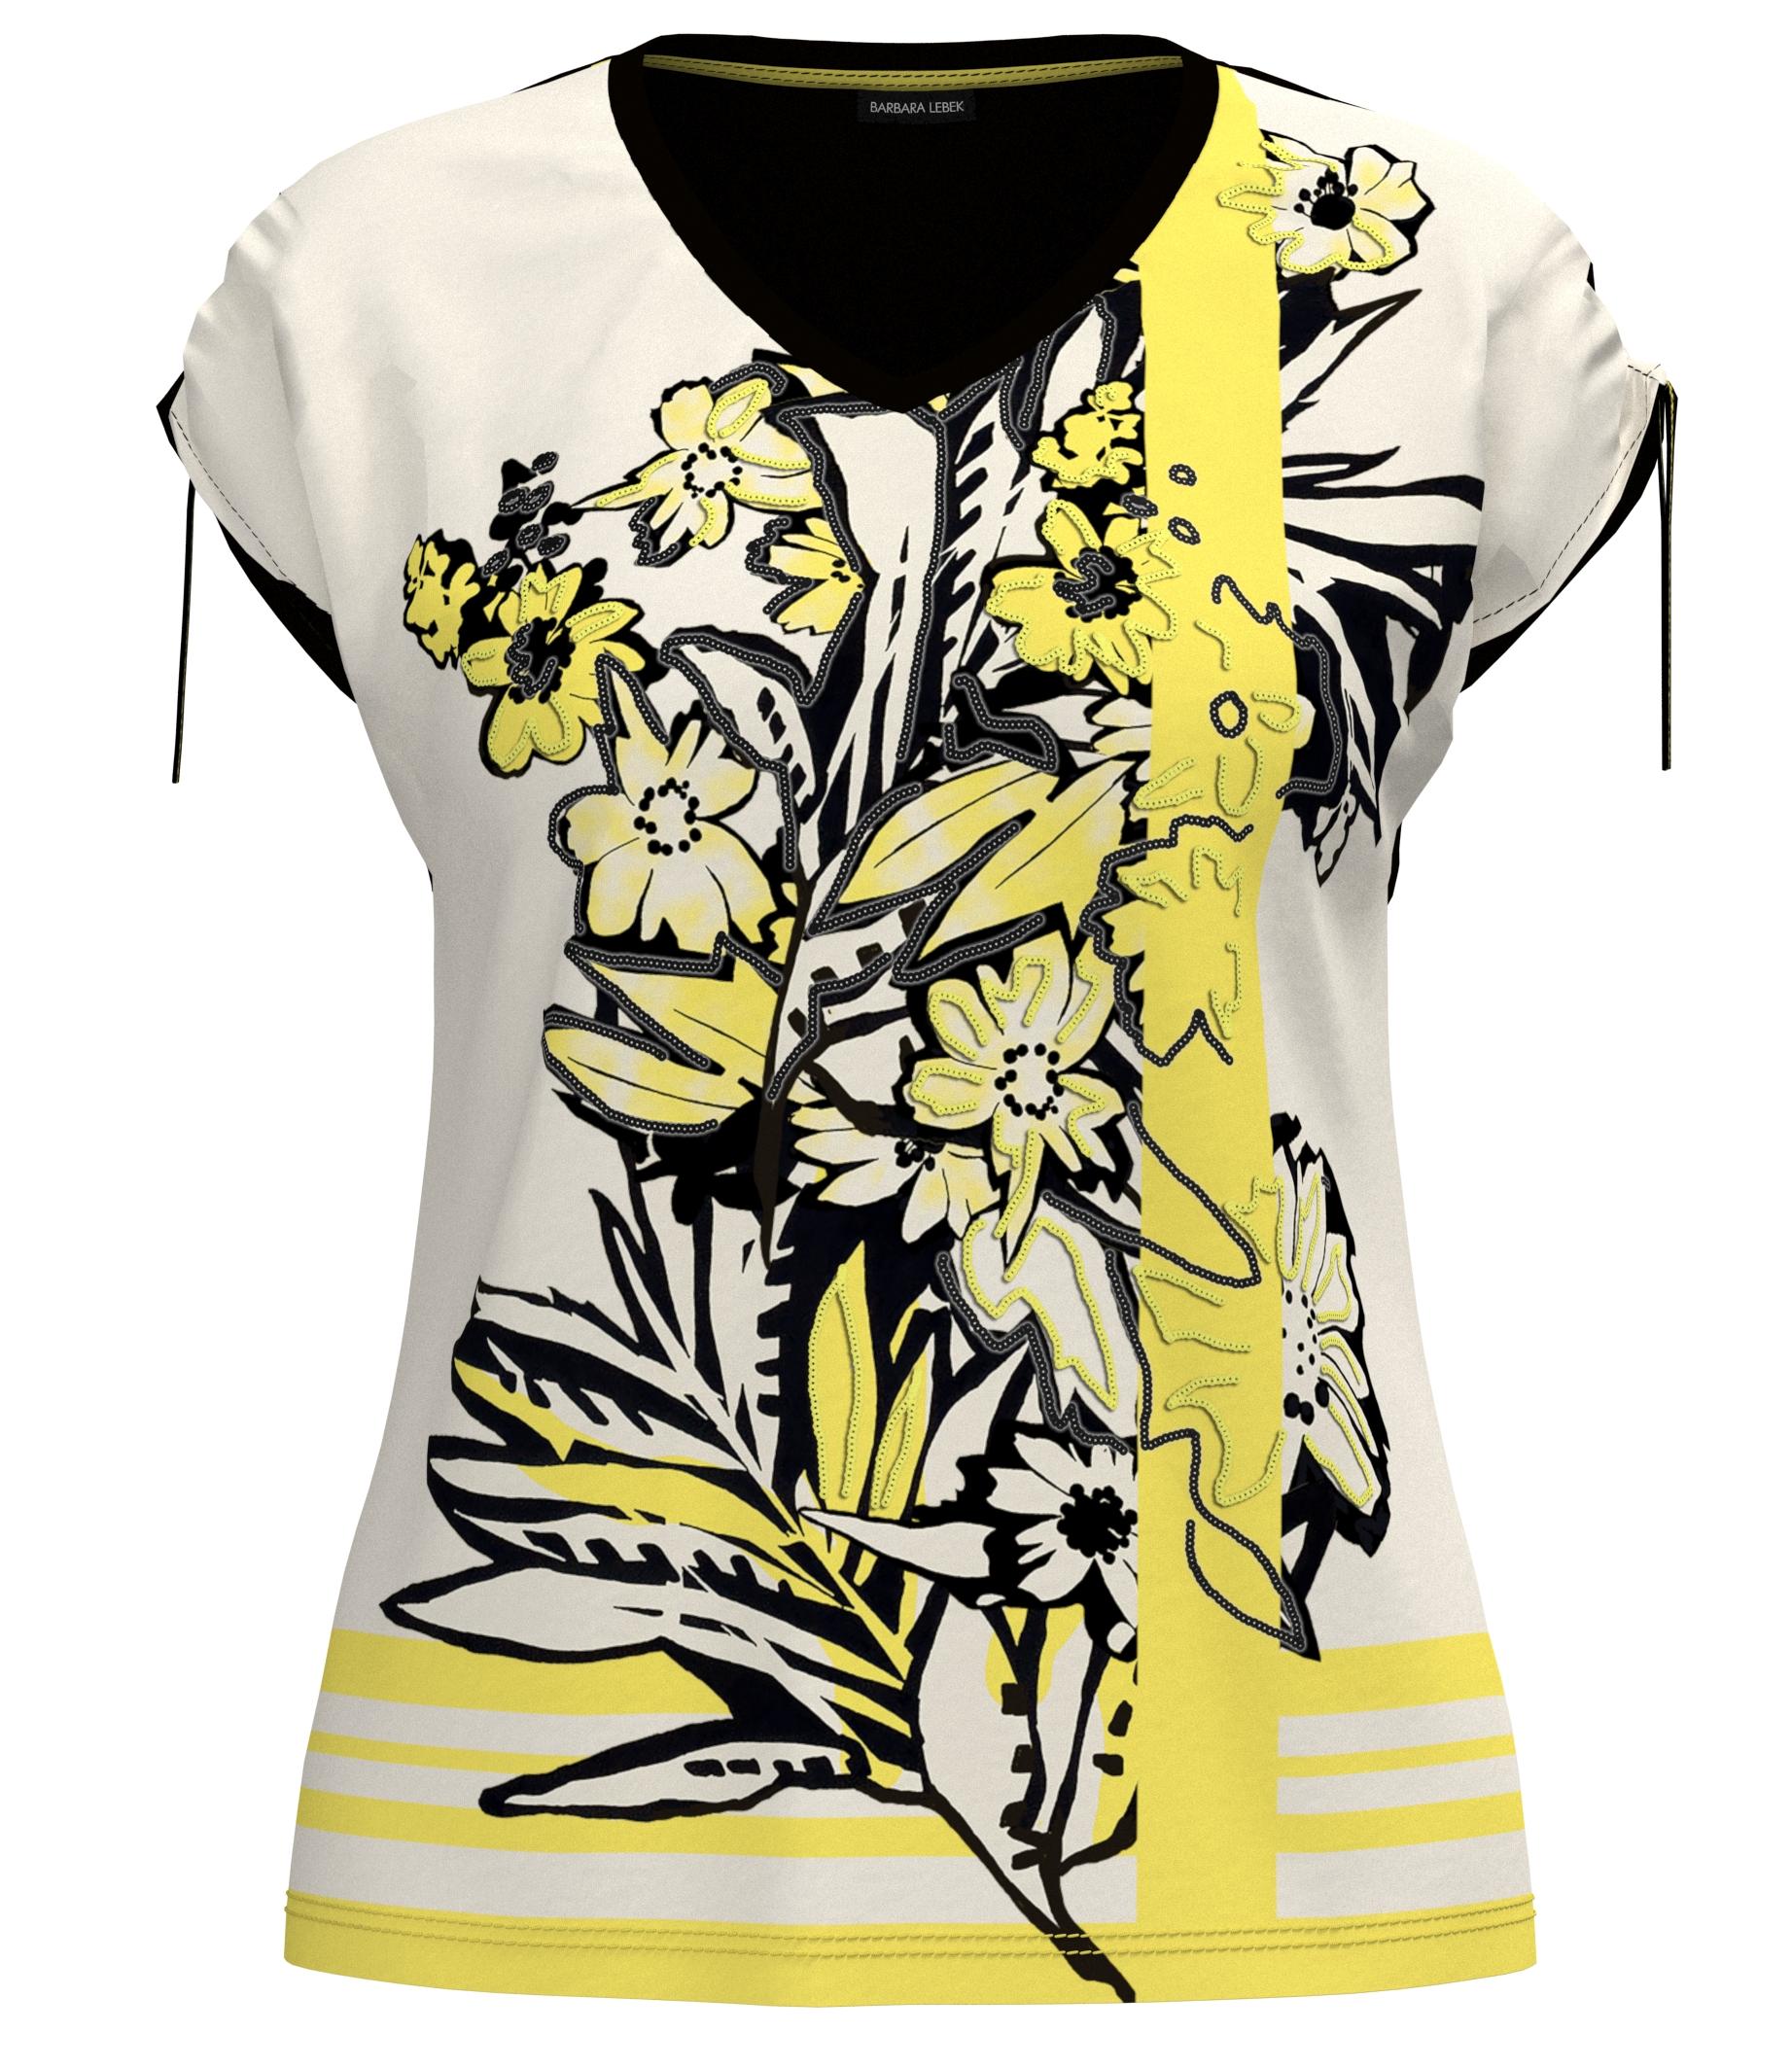 Barbara Lebek kurzarm Shirt floral gemustert schwarz